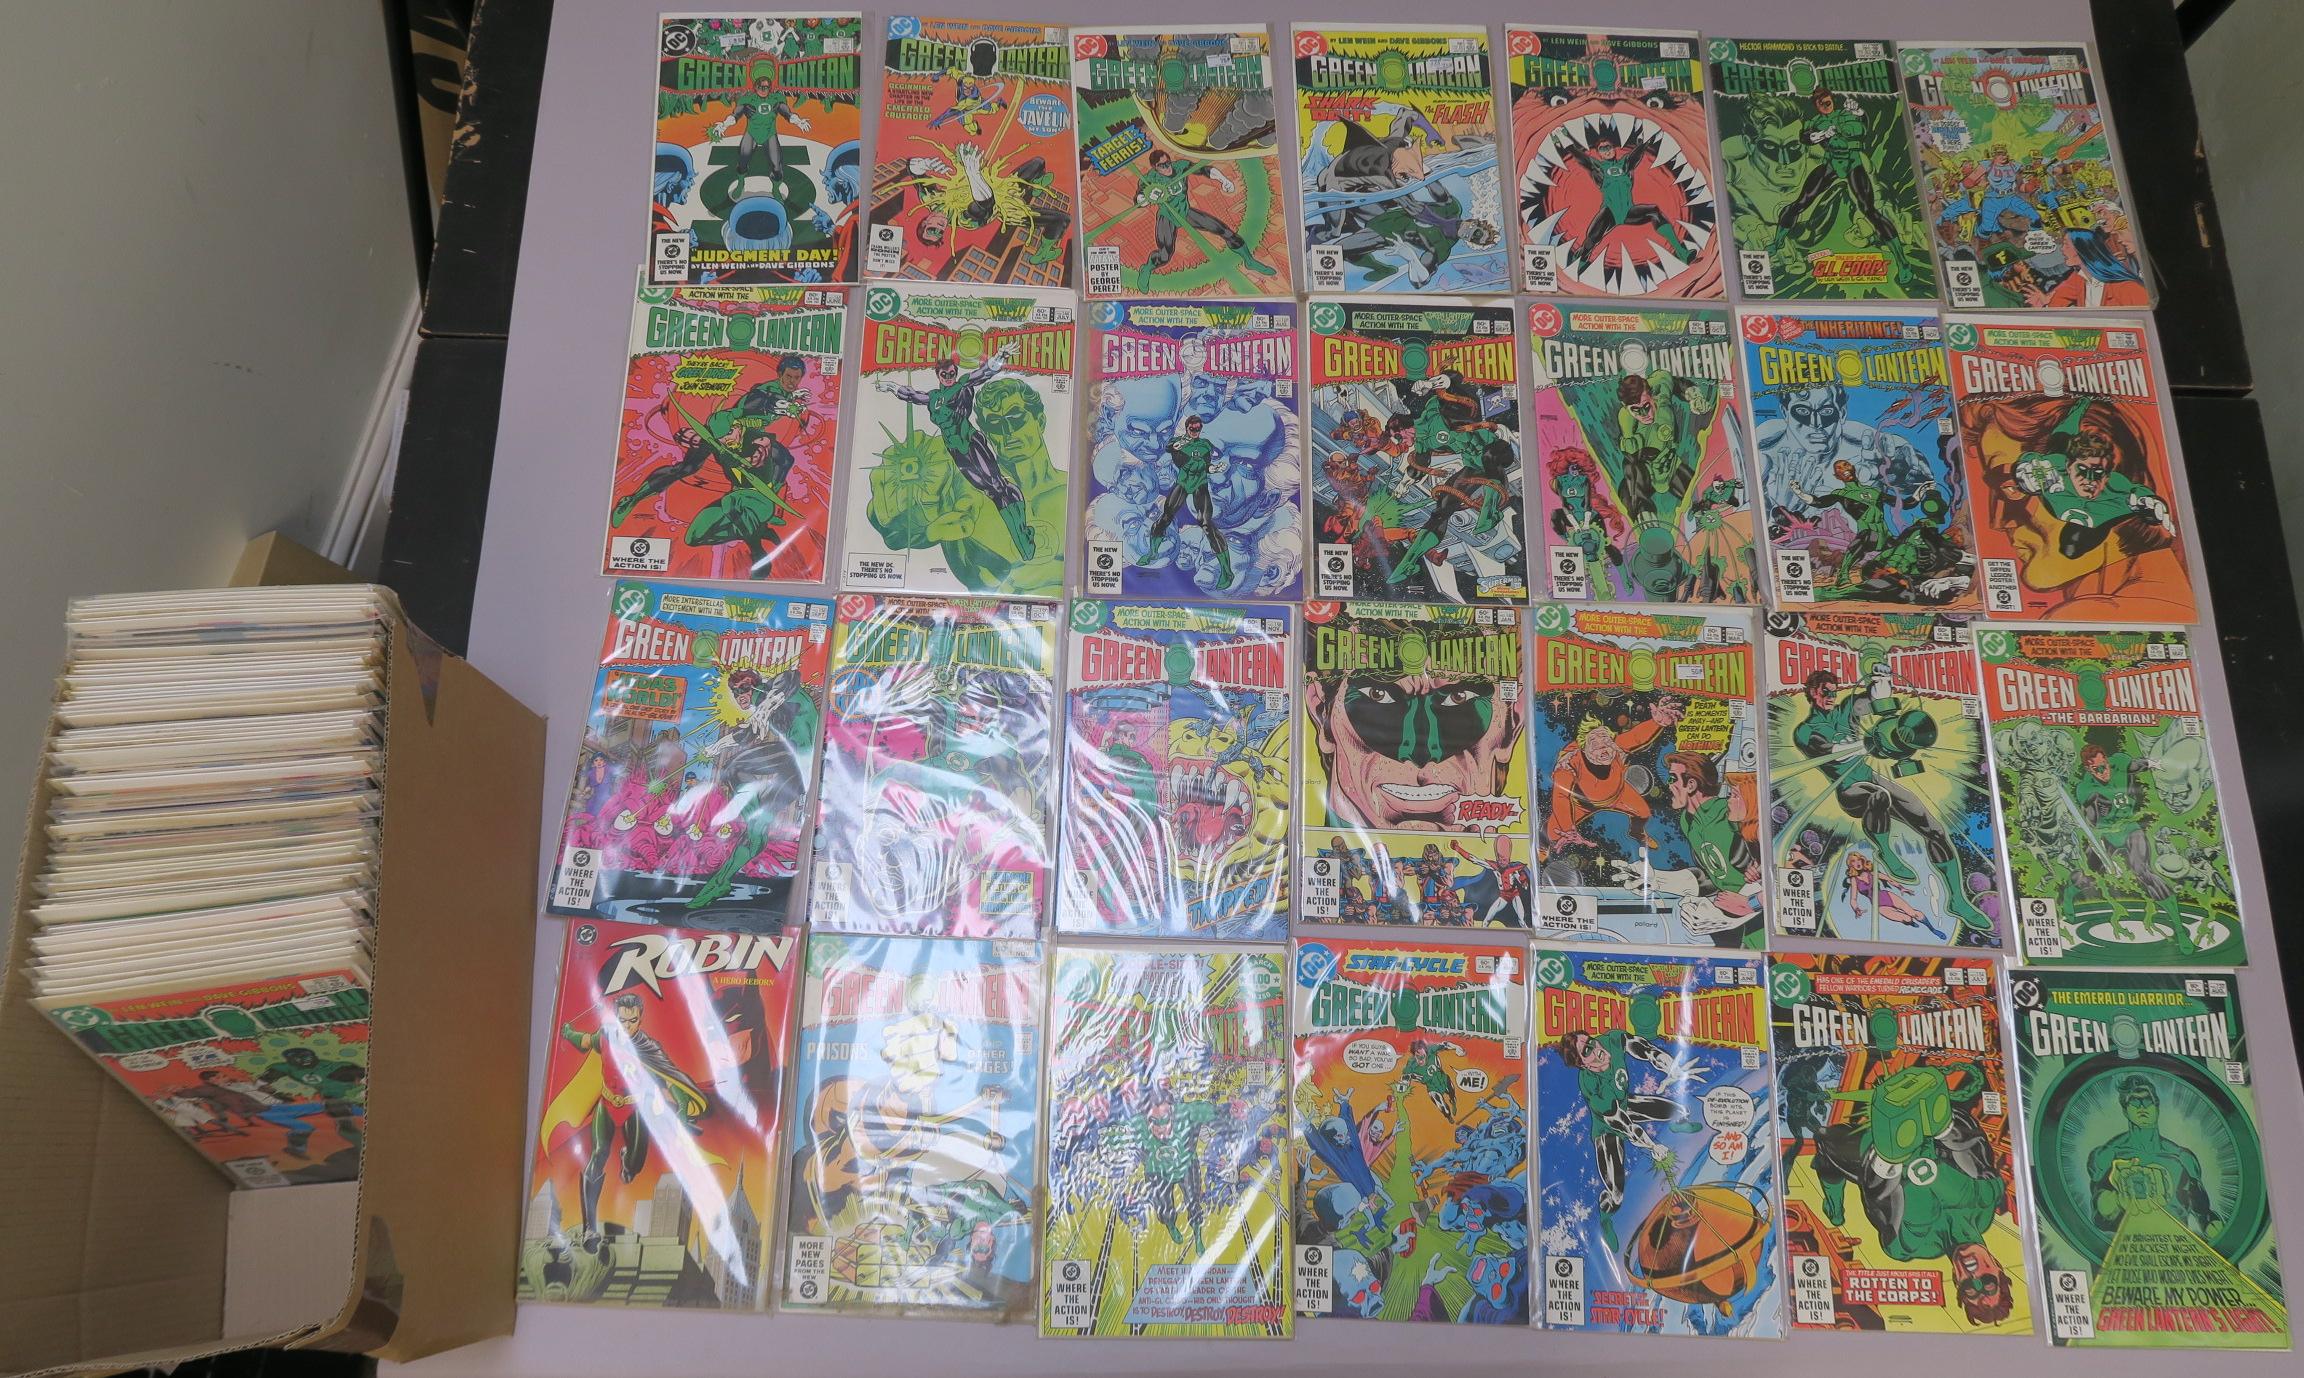 Lot 19 - Green Lantern DC comics collection including Green Lantern nos 146, 150, 152, 153, 154, 155, 156,